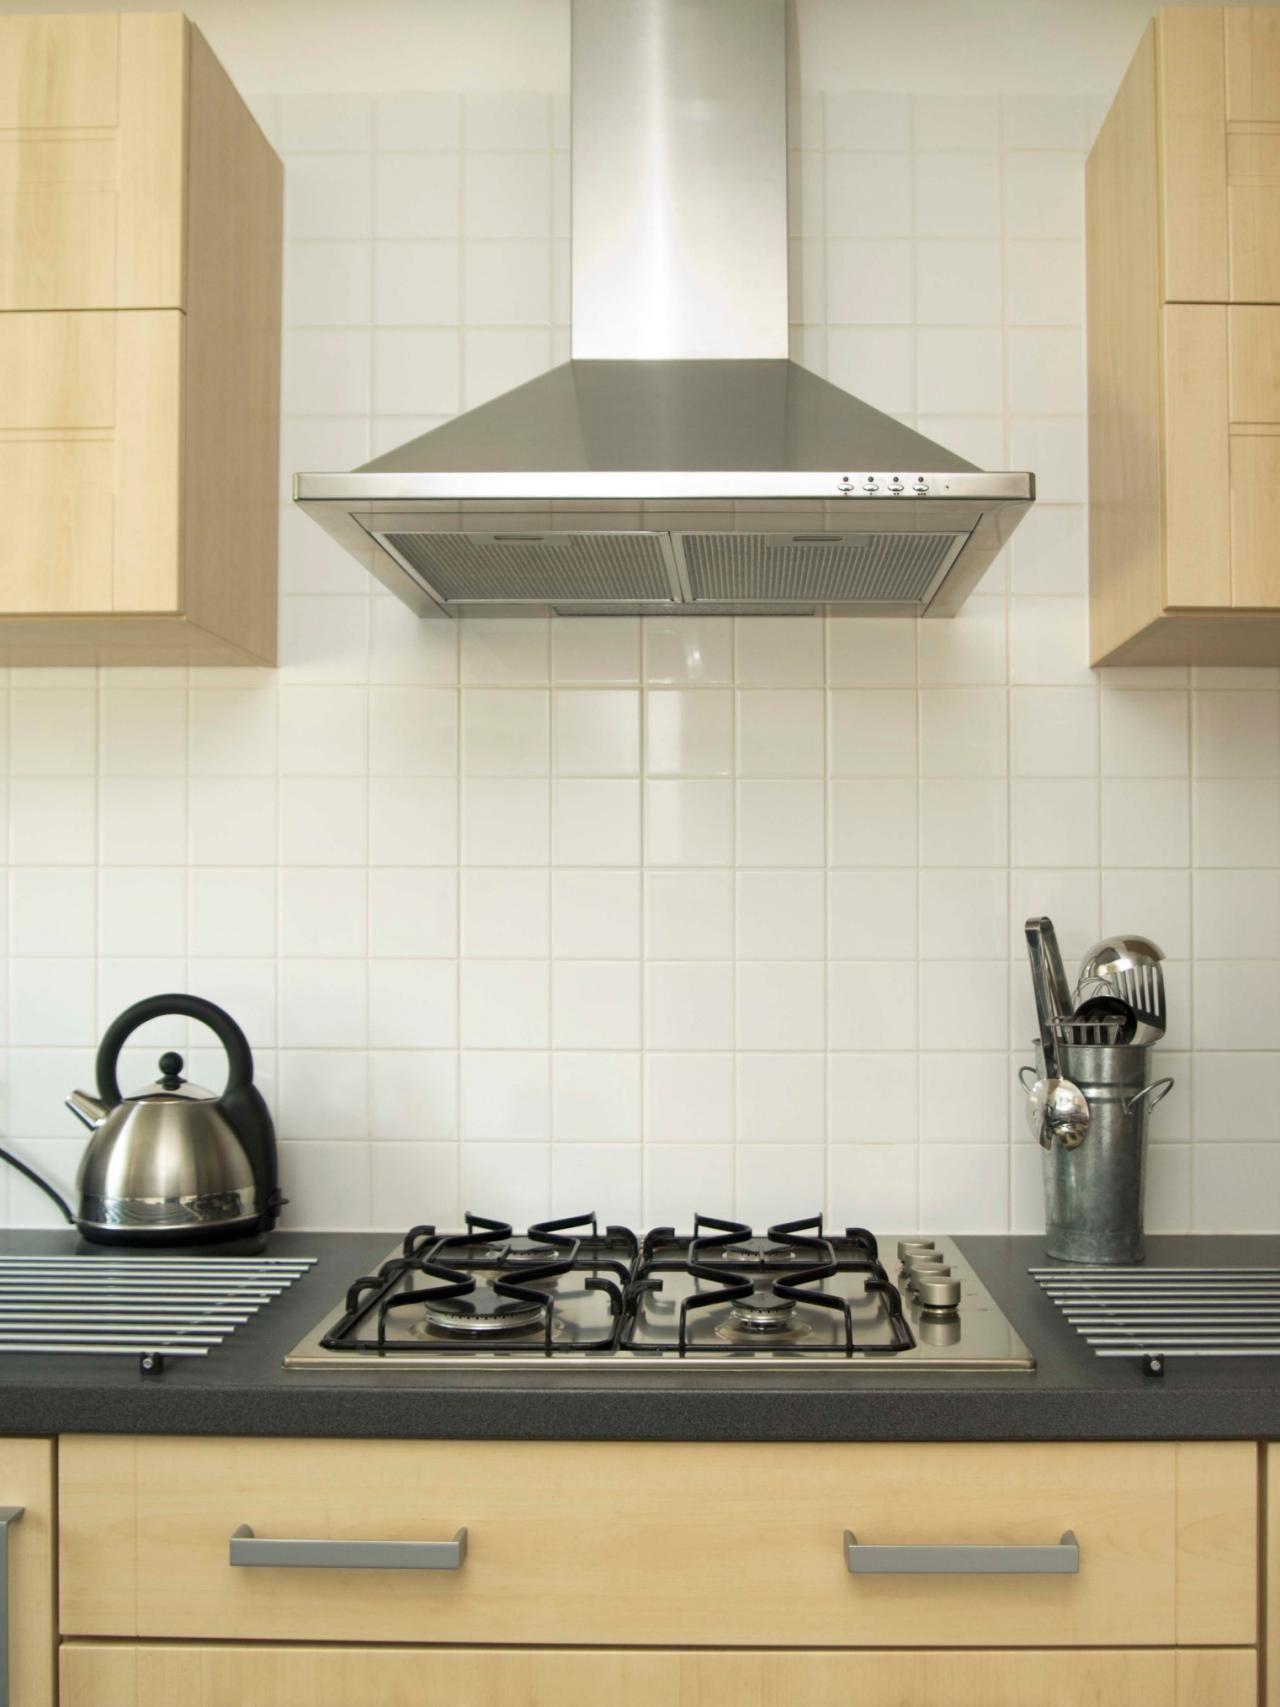 Kitchen Design With Exhaust Fan Kitchen Fan Exhaust Fan Kitchen Kitchen Ventilation